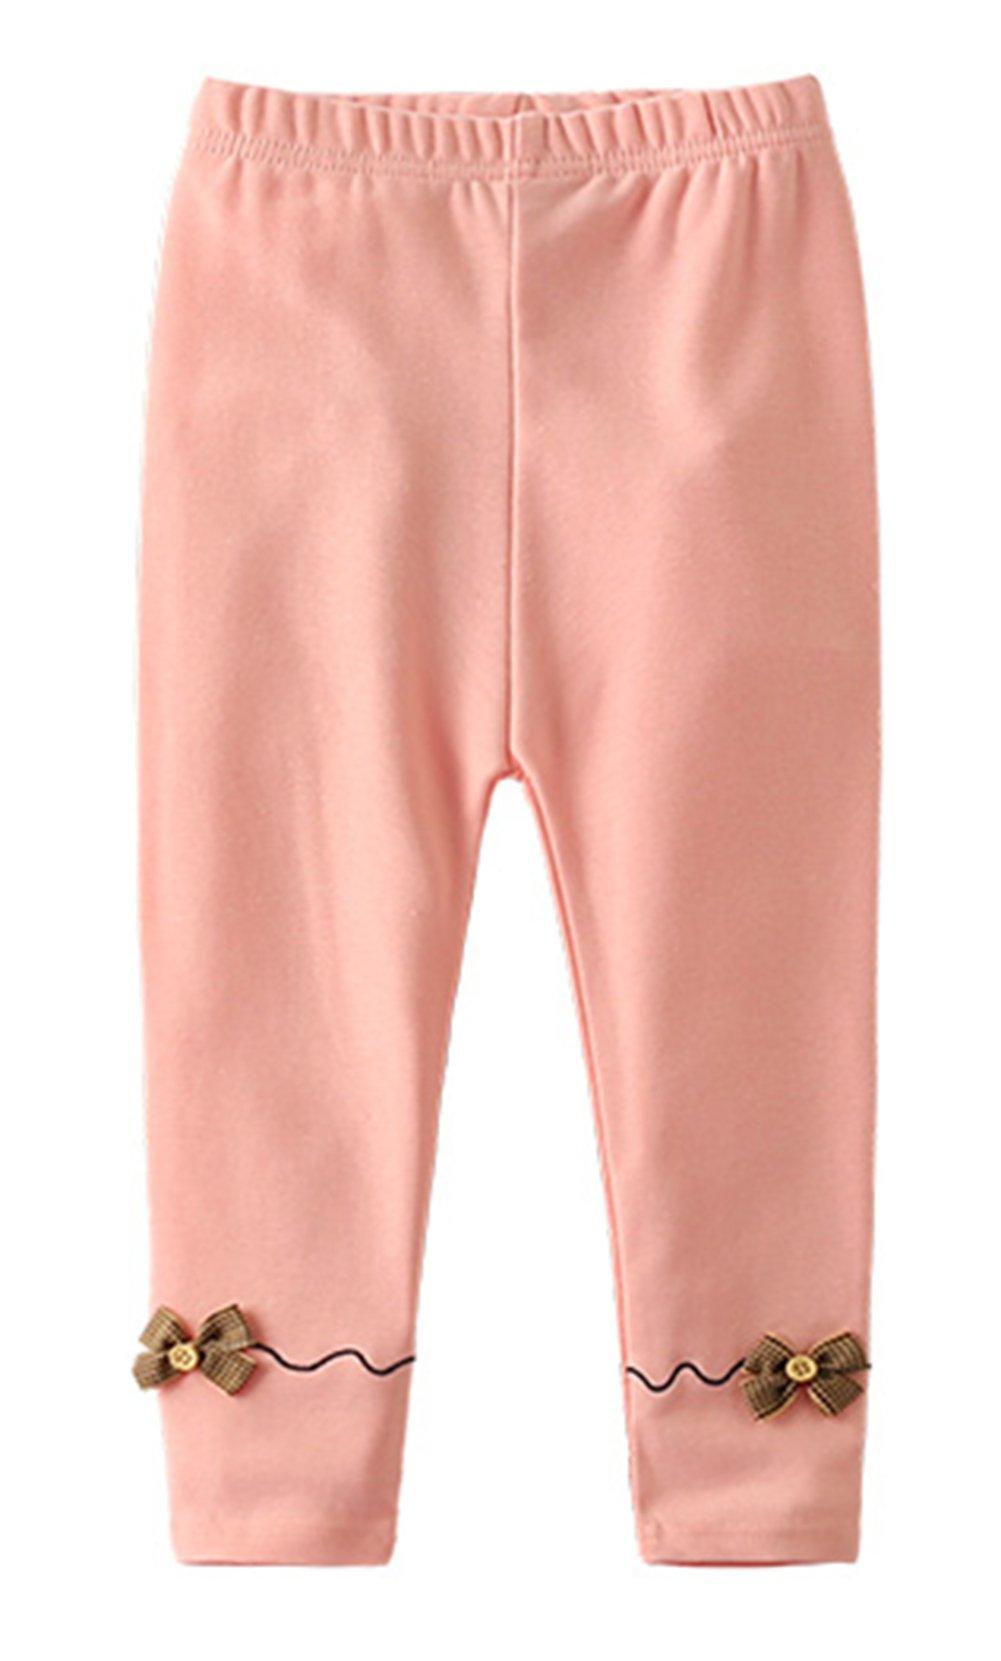 stylesilove Girls Soft Cotton Embellished Ribbon Jersey Leggings (110/4-5 Years, Pink)